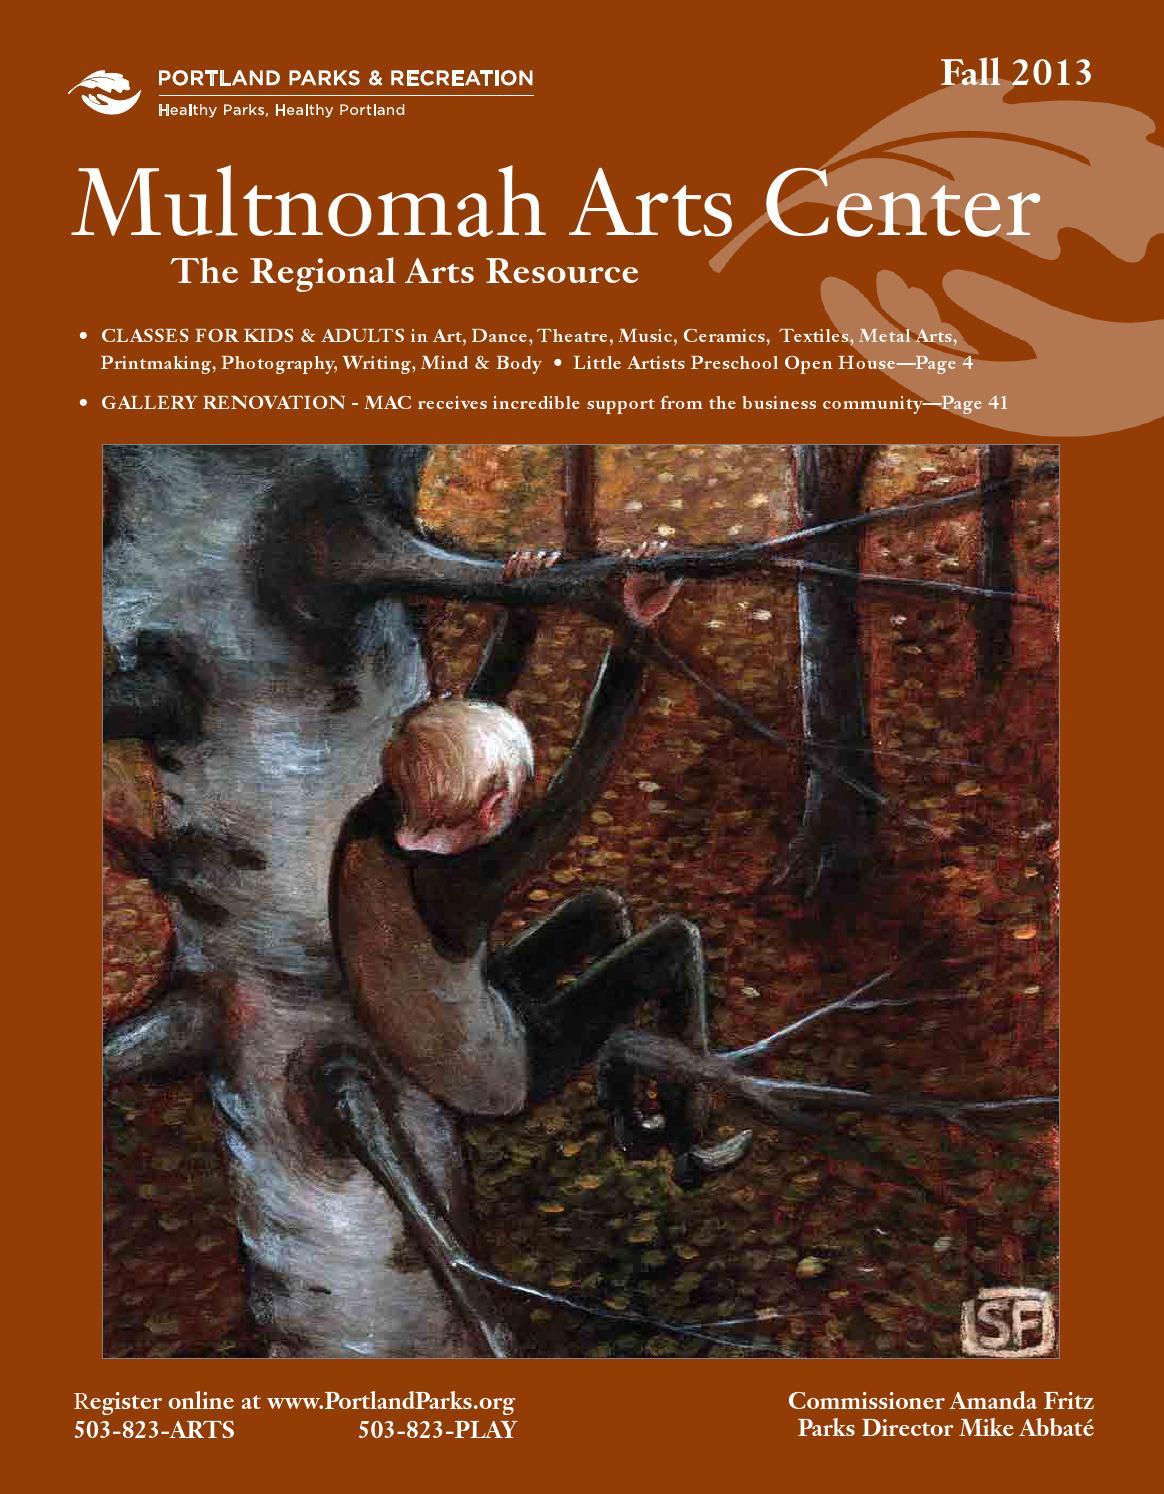 Multnomah Arts Center